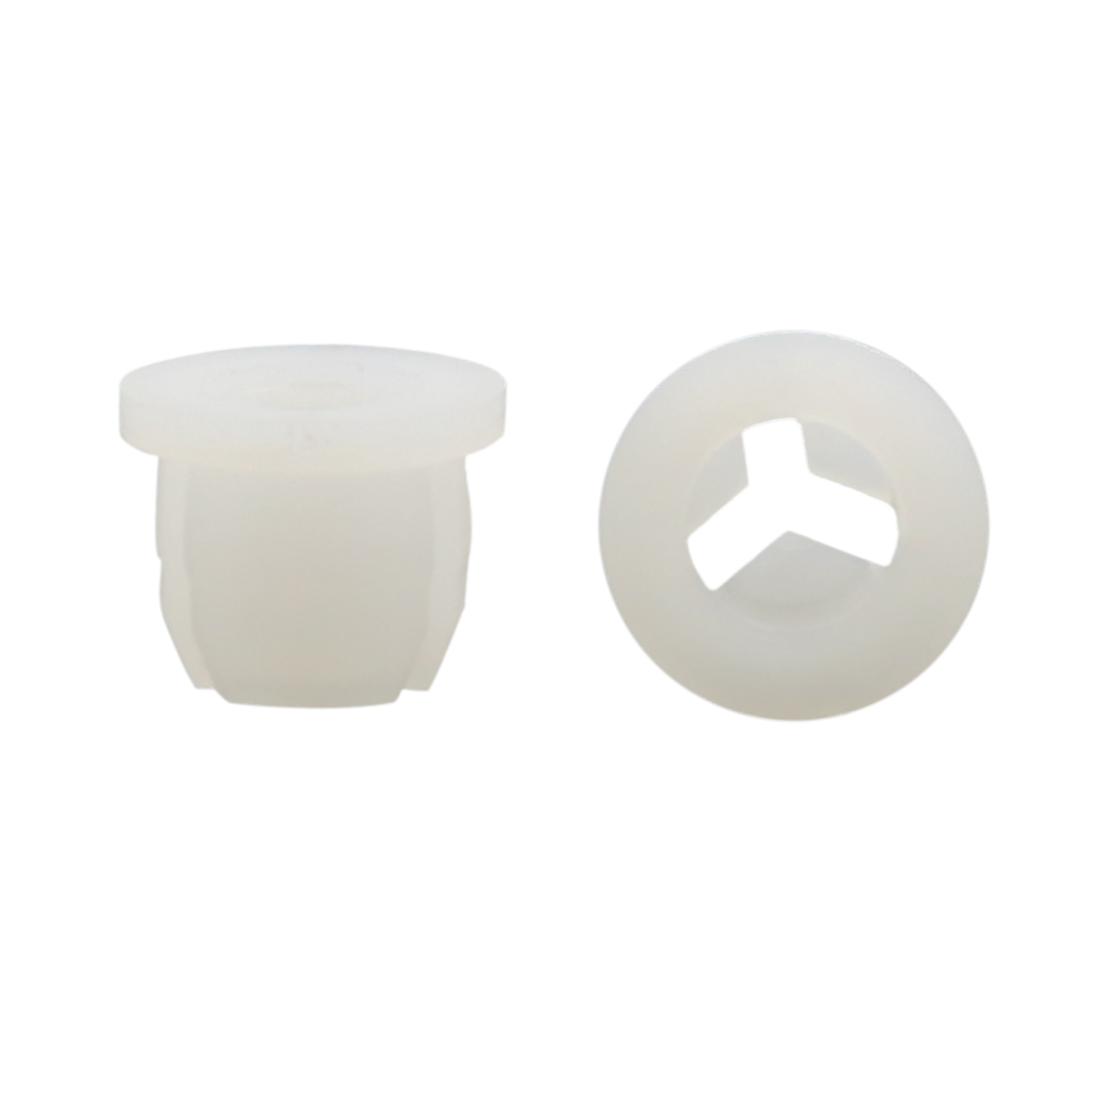 40Pcs White Plastic Rivets Fastener Fender Bumper Push Clips 10mm for Car